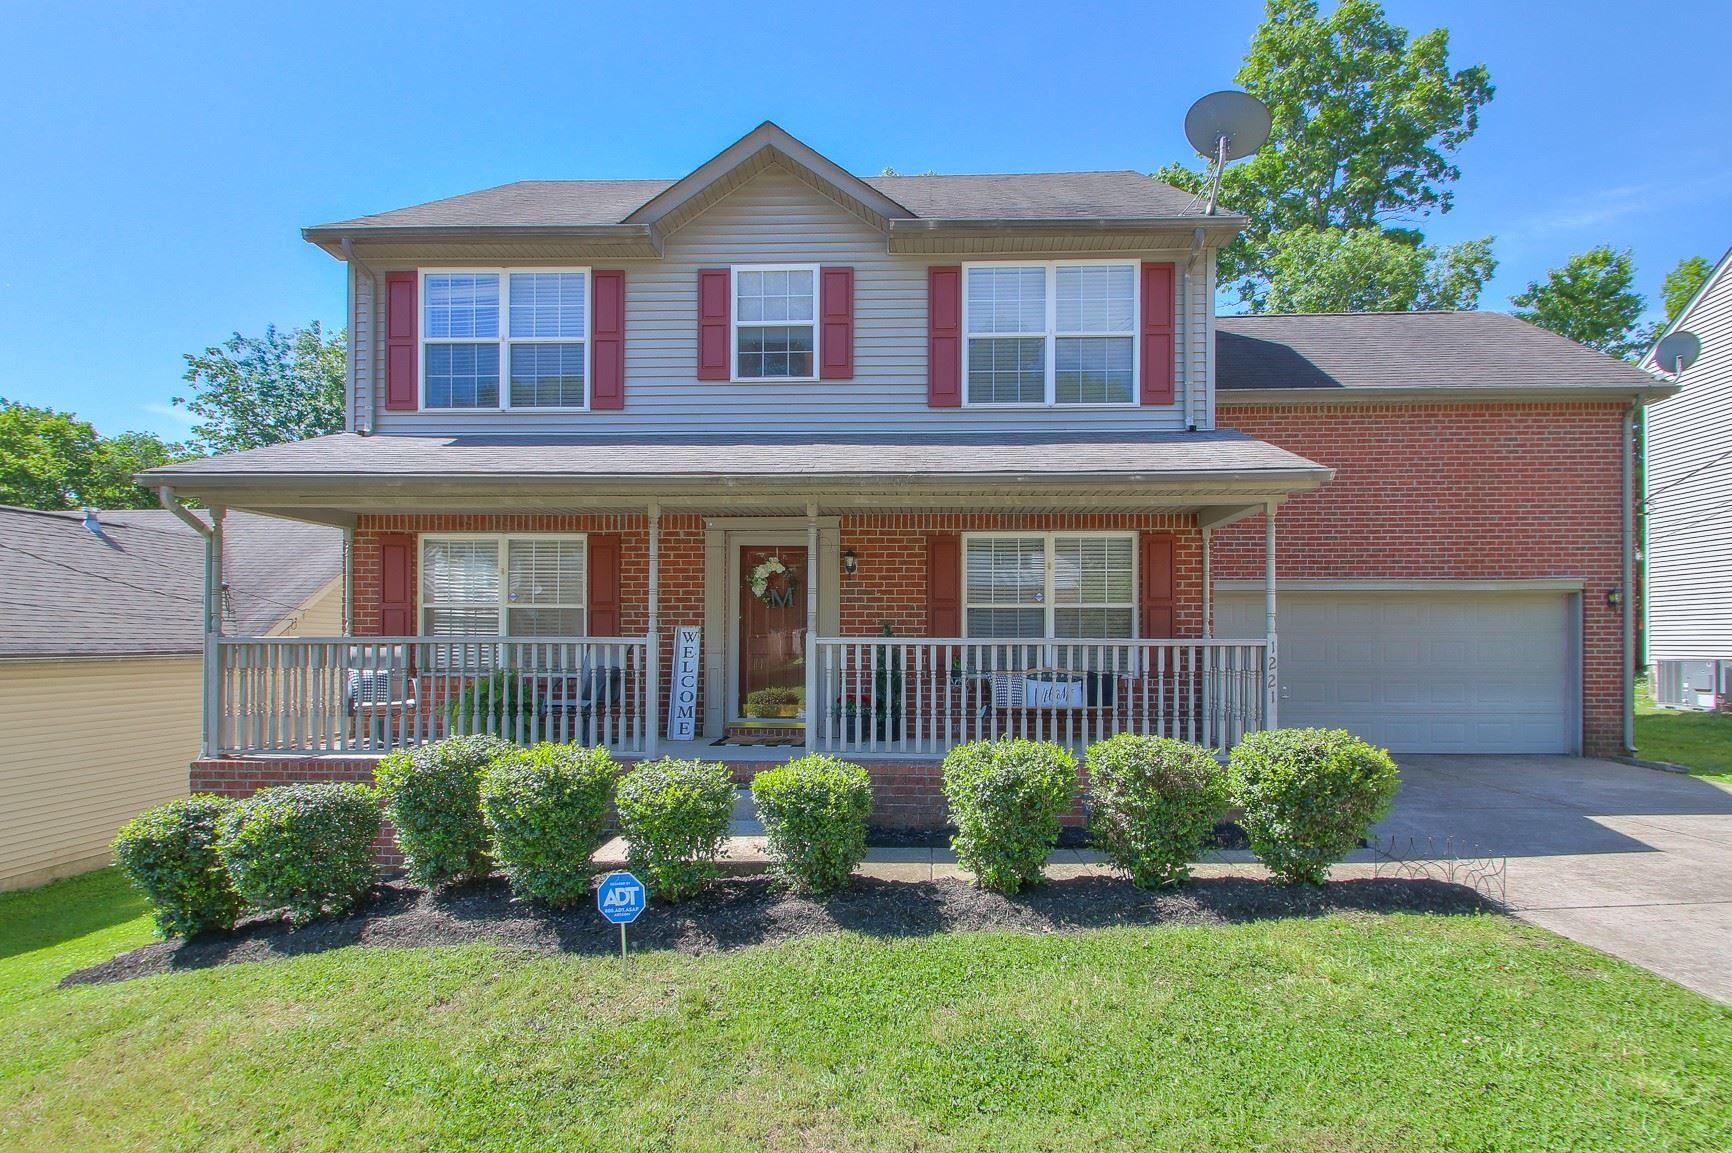 1221 Twin Circle Dr, Nashville, TN 37217 - MLS#: 2253504